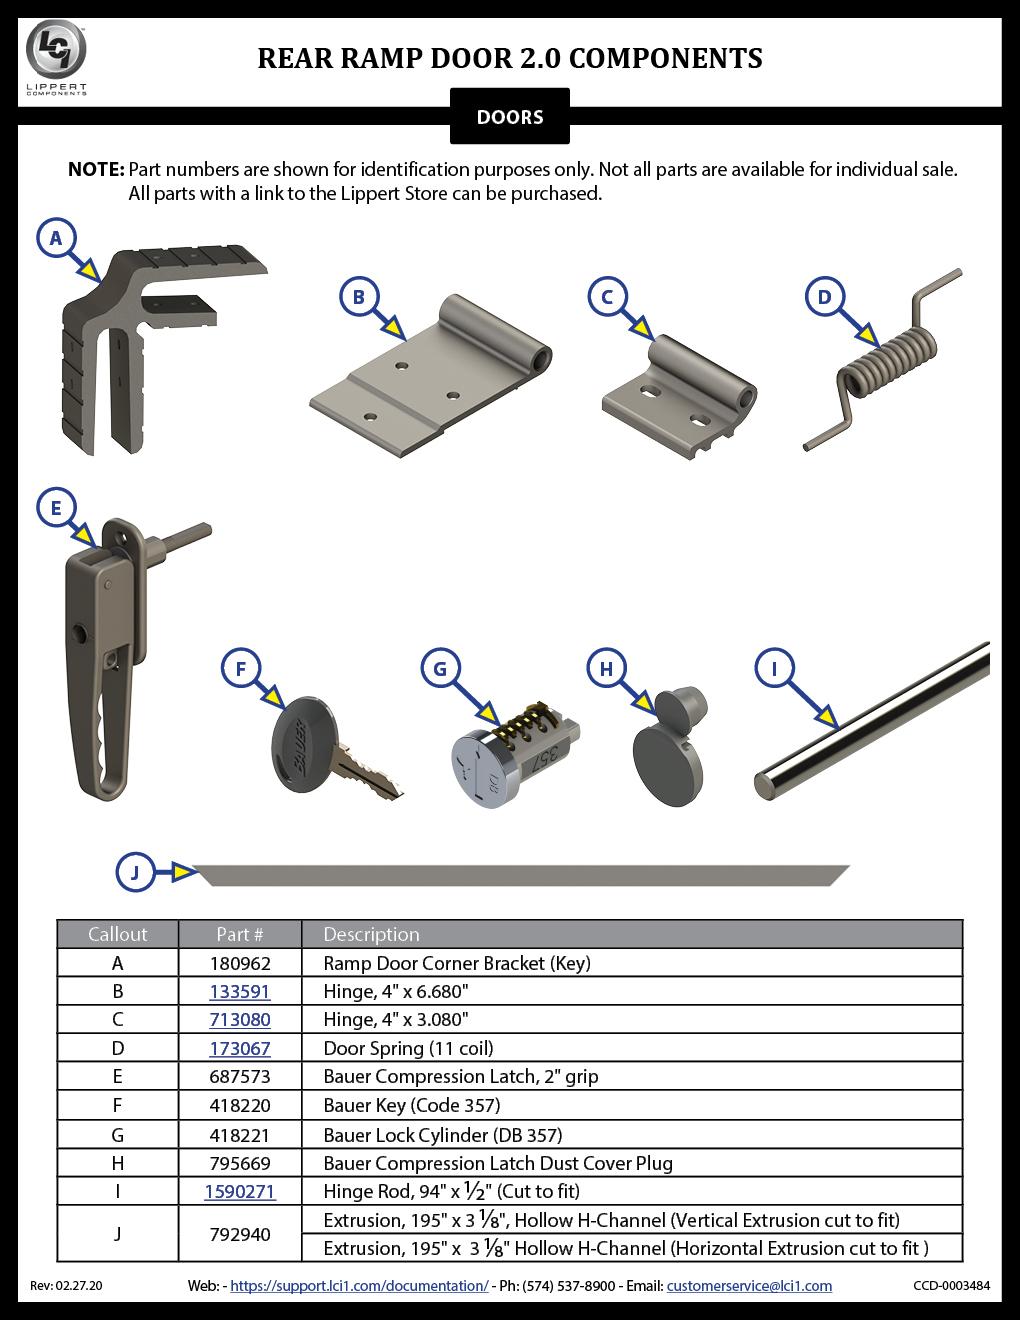 Rear Ramp Door 2.0 Components